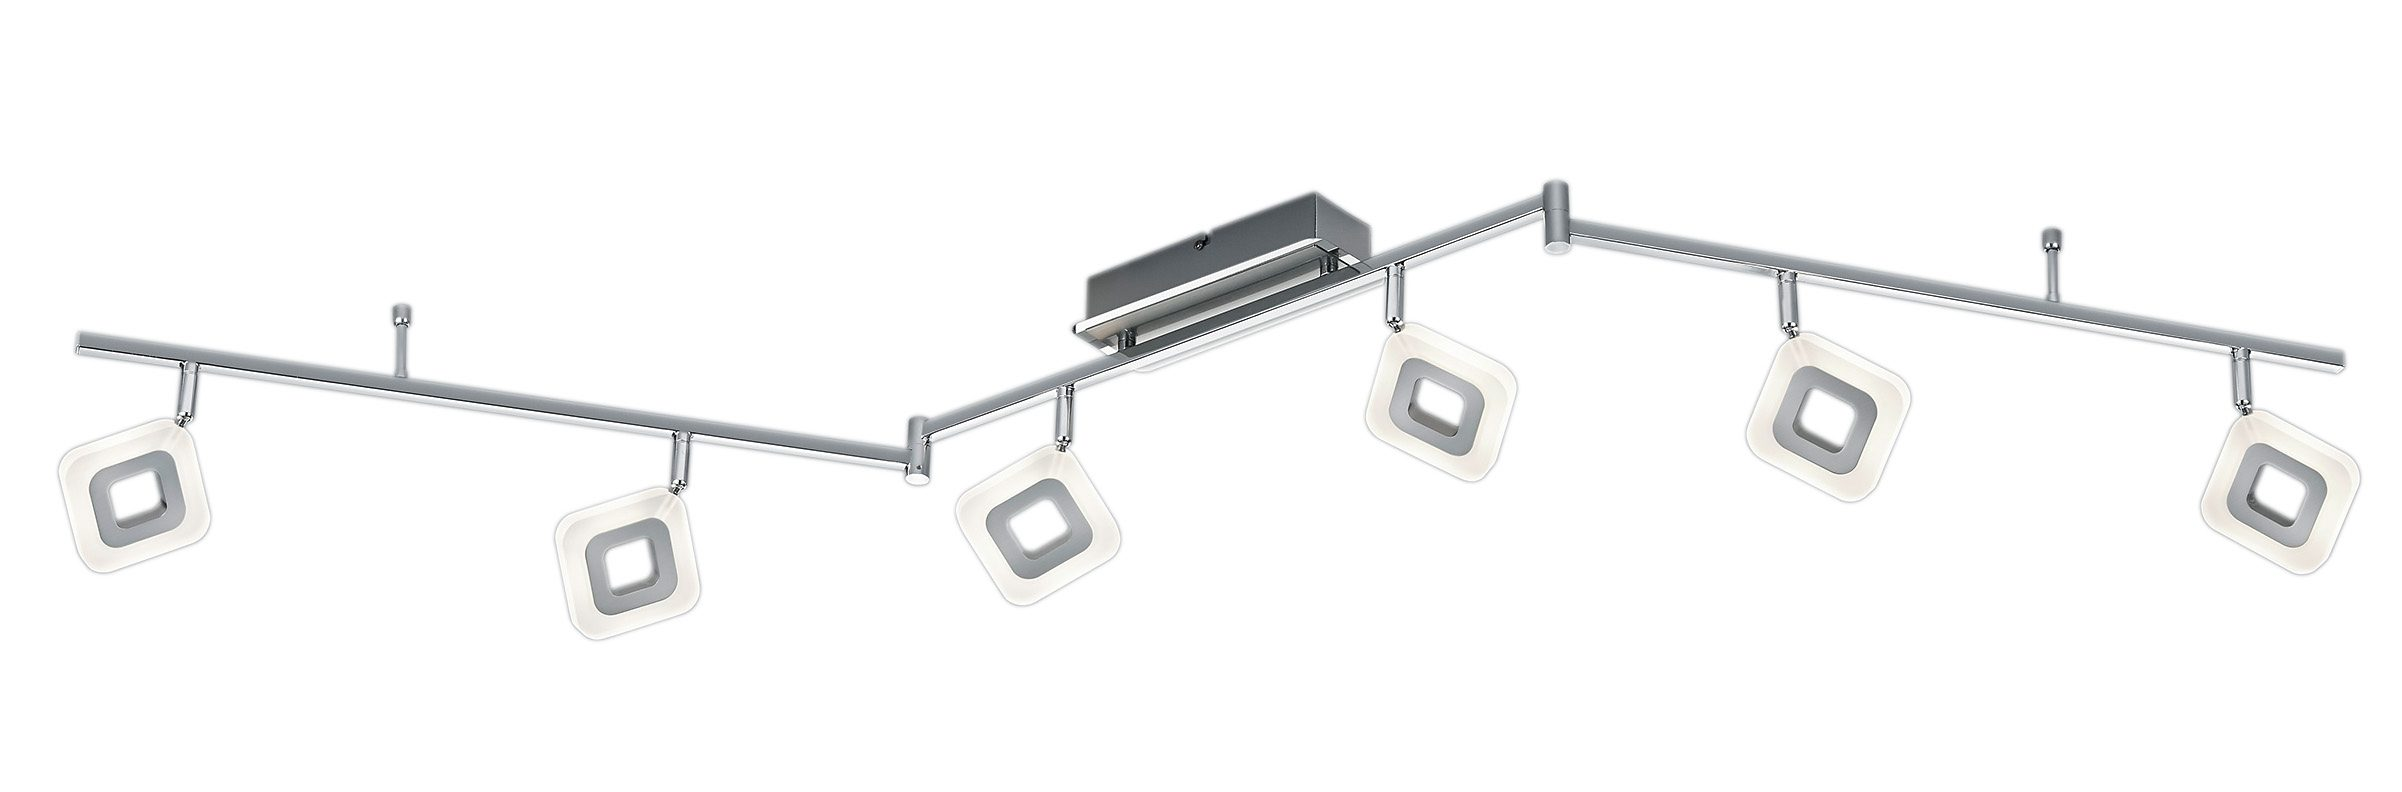 Trio LED-Deckenleuchte, 6 flg., »PARADOX«